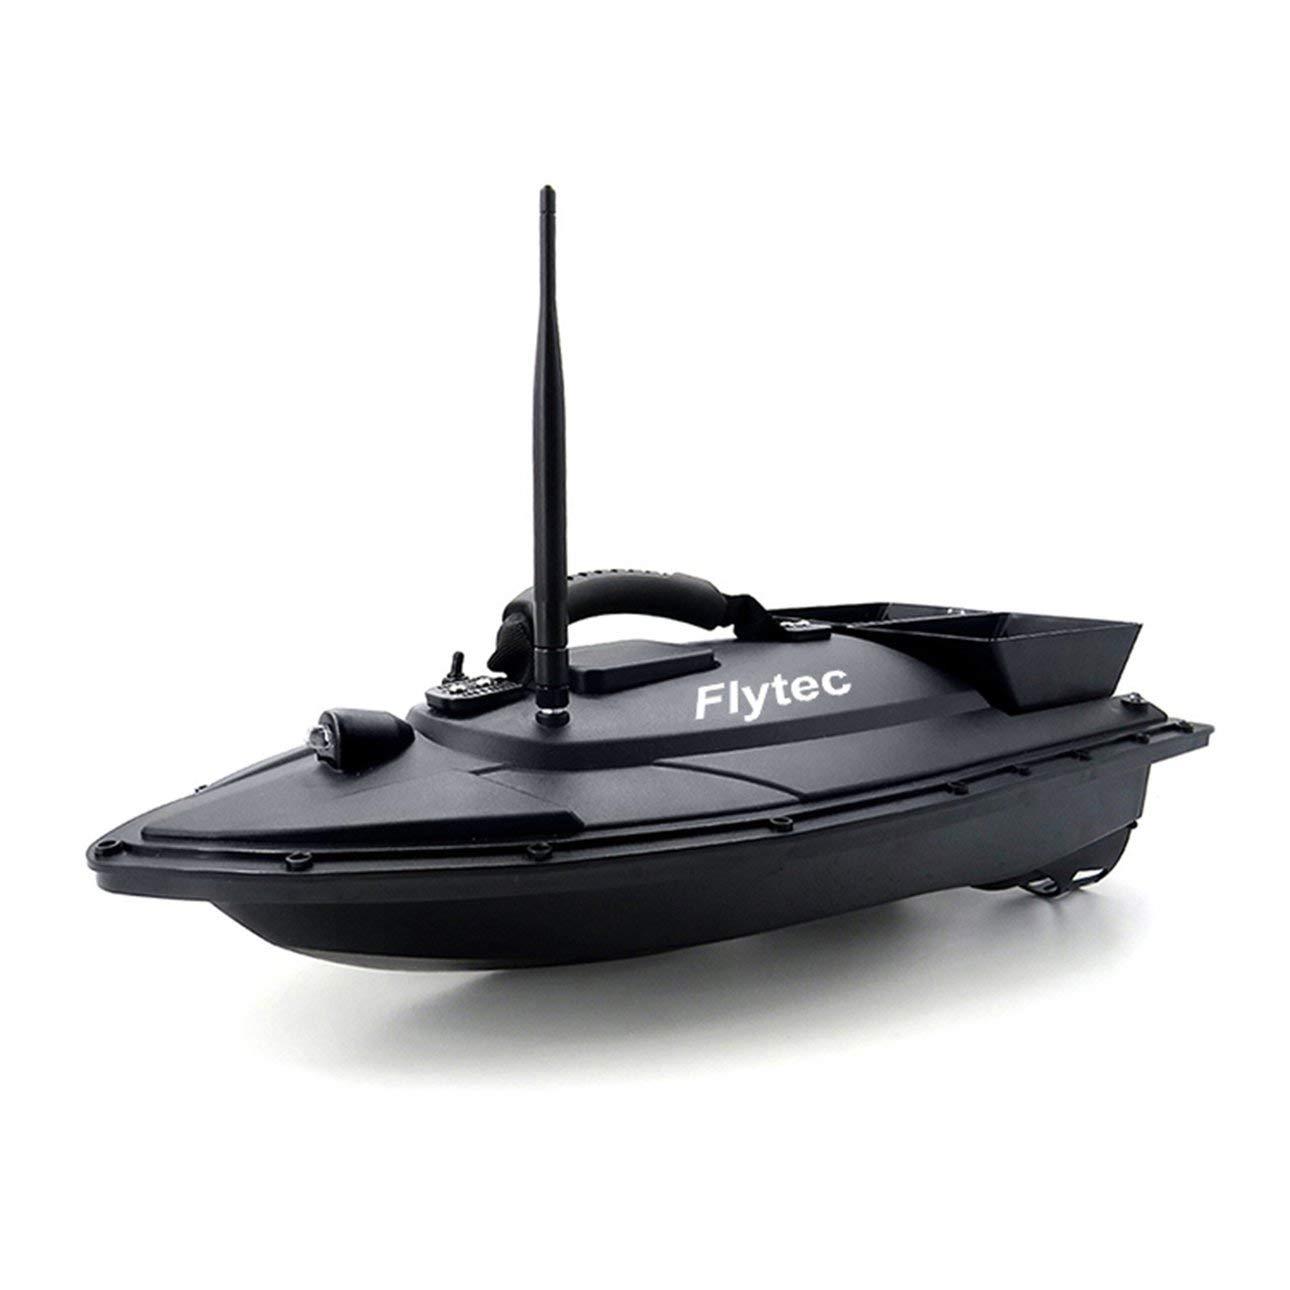 Ballylelly RC Boat Flytec 2011-5 Strumento di Pesca Smart RC Boat Toy Dual Motor Fish Finder Fish Boat (Nero)